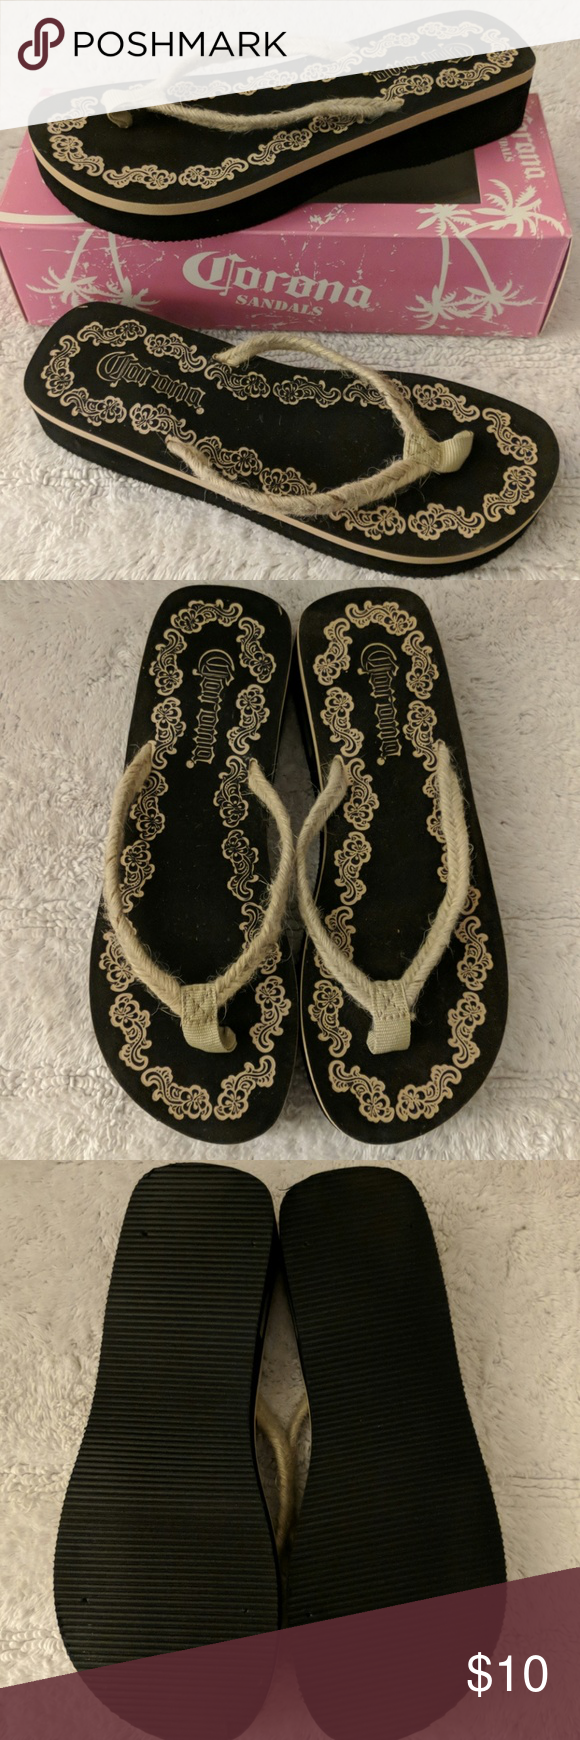 37edda520e5ab Corona thong sandals women s 7 8 Corona thong sandals women s size 7 8.